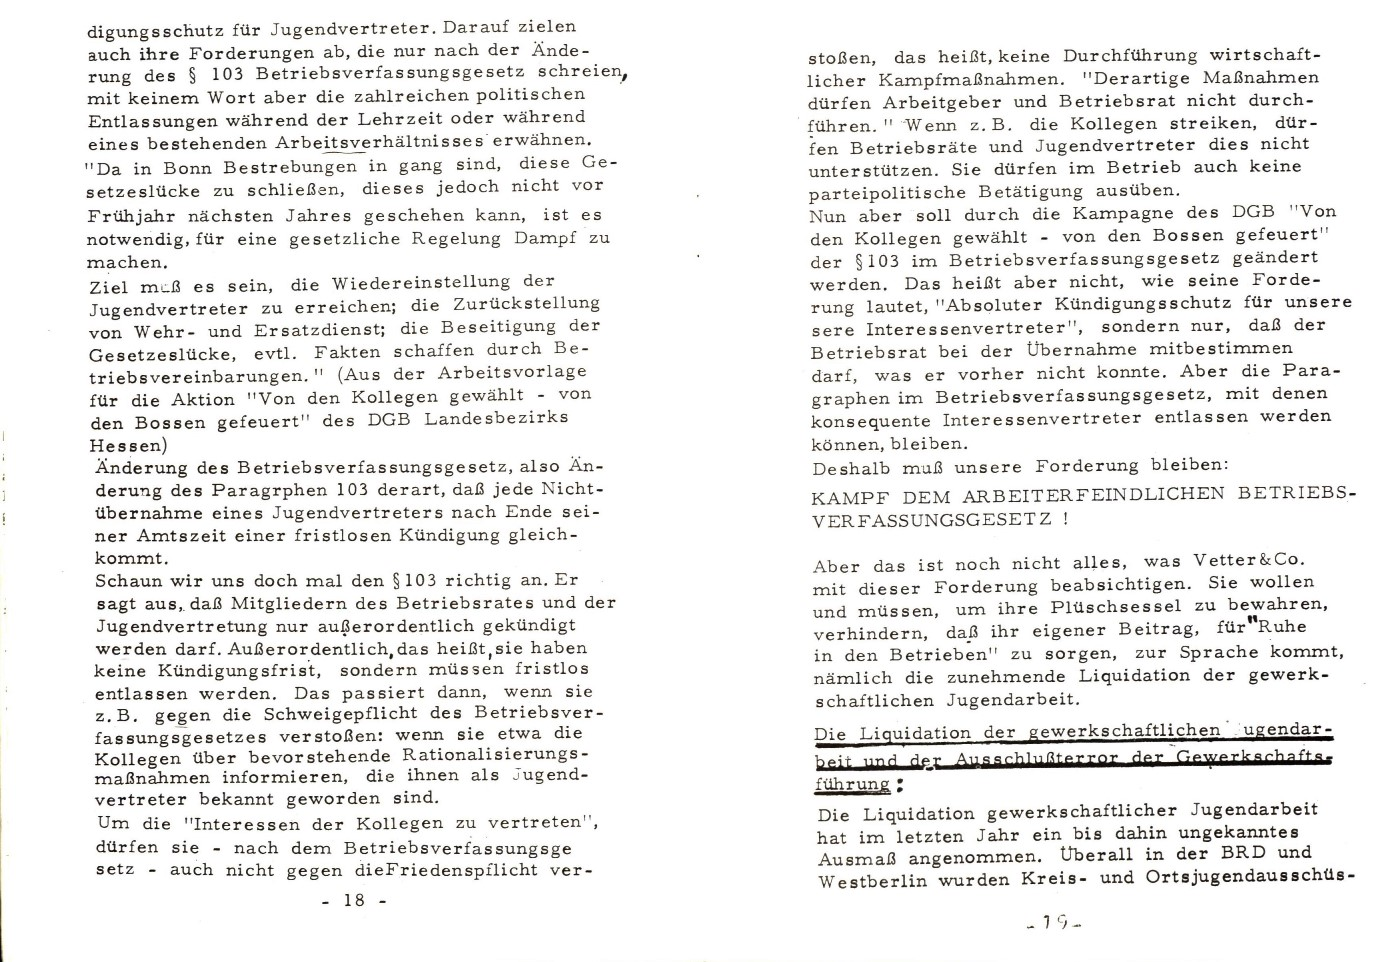 KJV_1973_NK_Arbeiterjugend_11